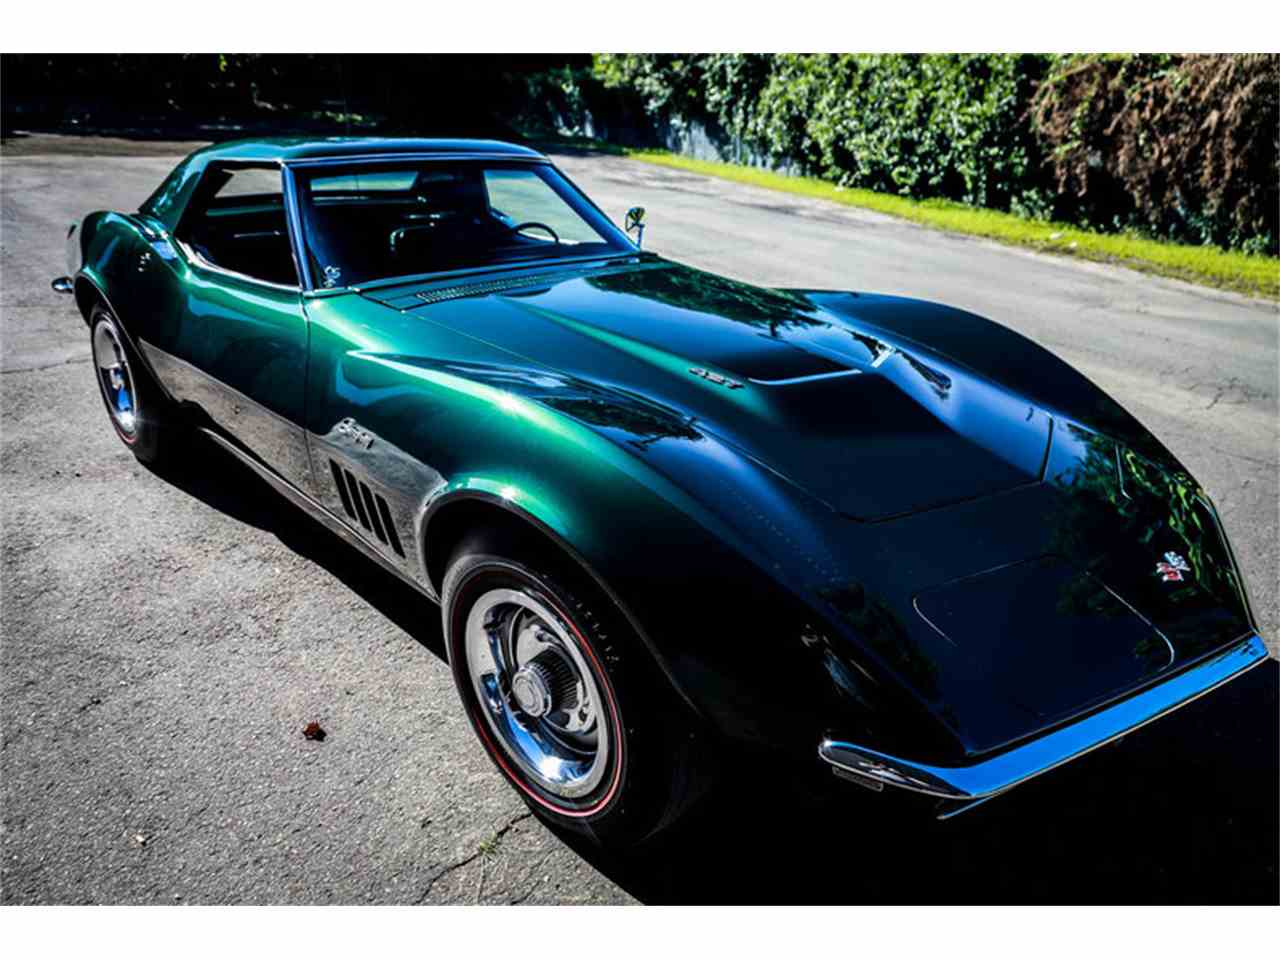 1968 chevrolet corvette for sale cc 1005826. Black Bedroom Furniture Sets. Home Design Ideas